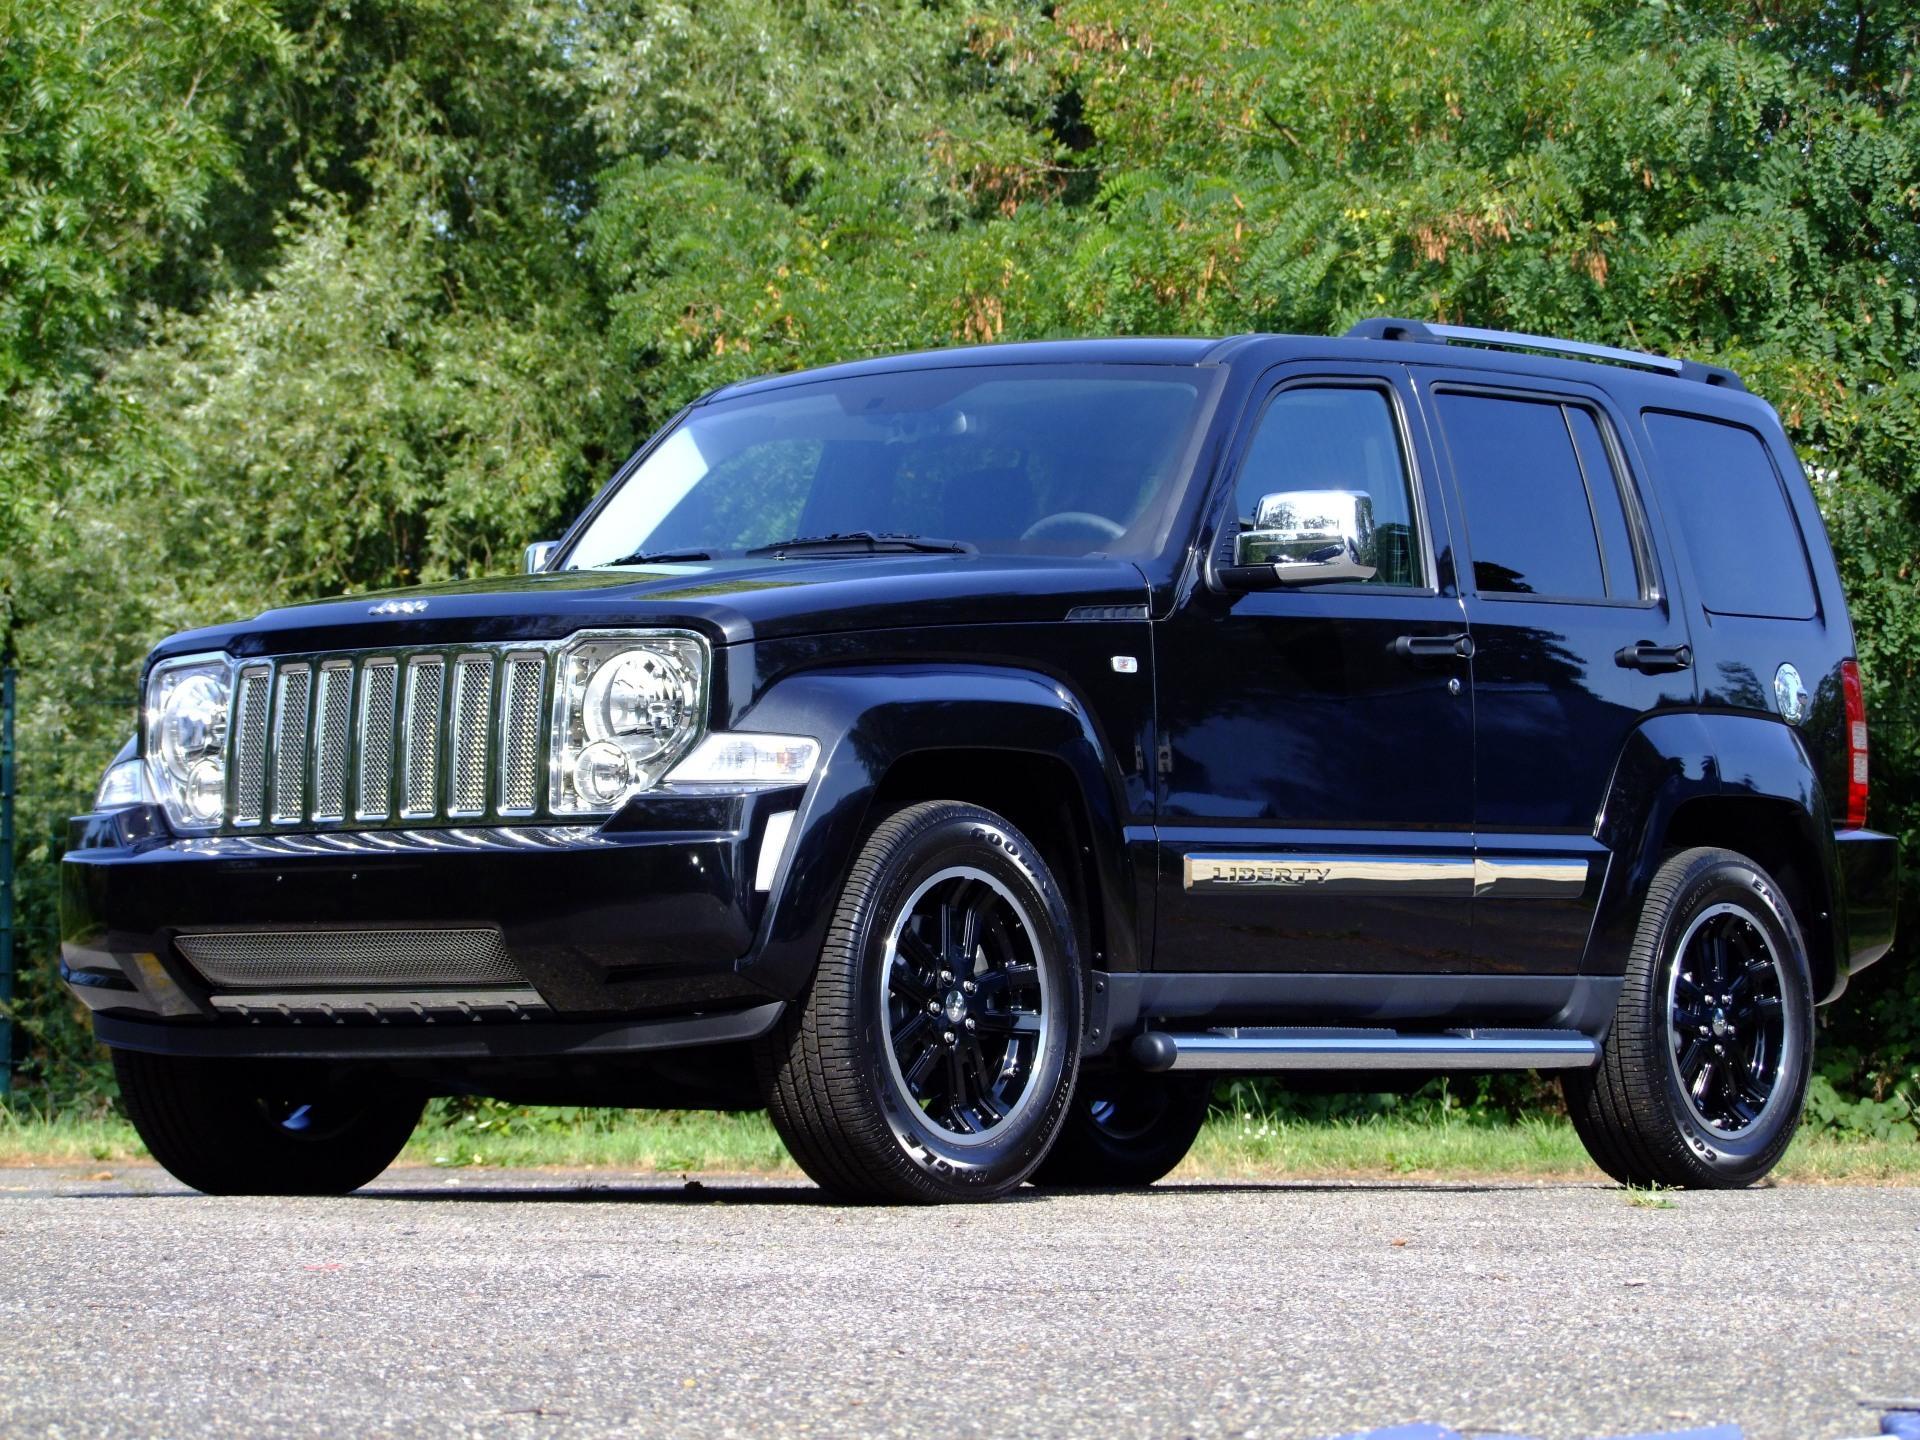 2010 jeep moparized liberty. Black Bedroom Furniture Sets. Home Design Ideas